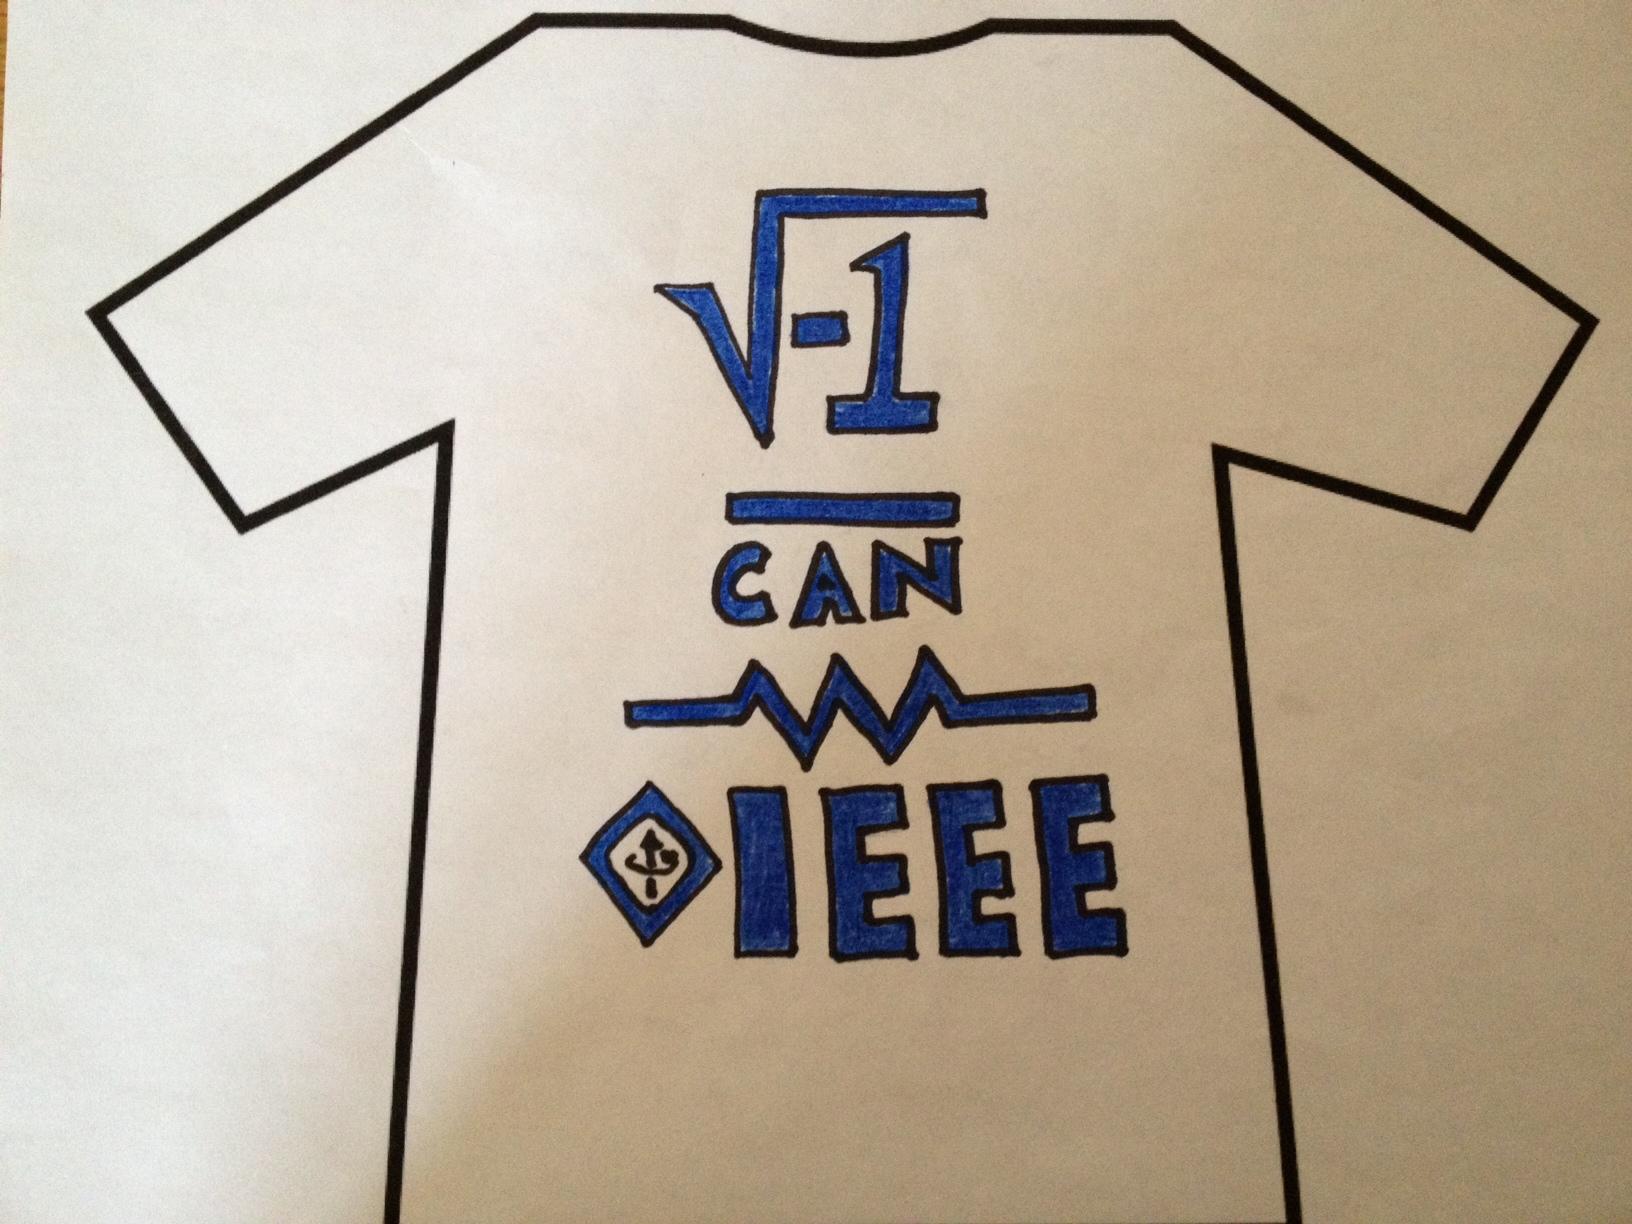 Design t shirt civil engineering -  T Shirt Design